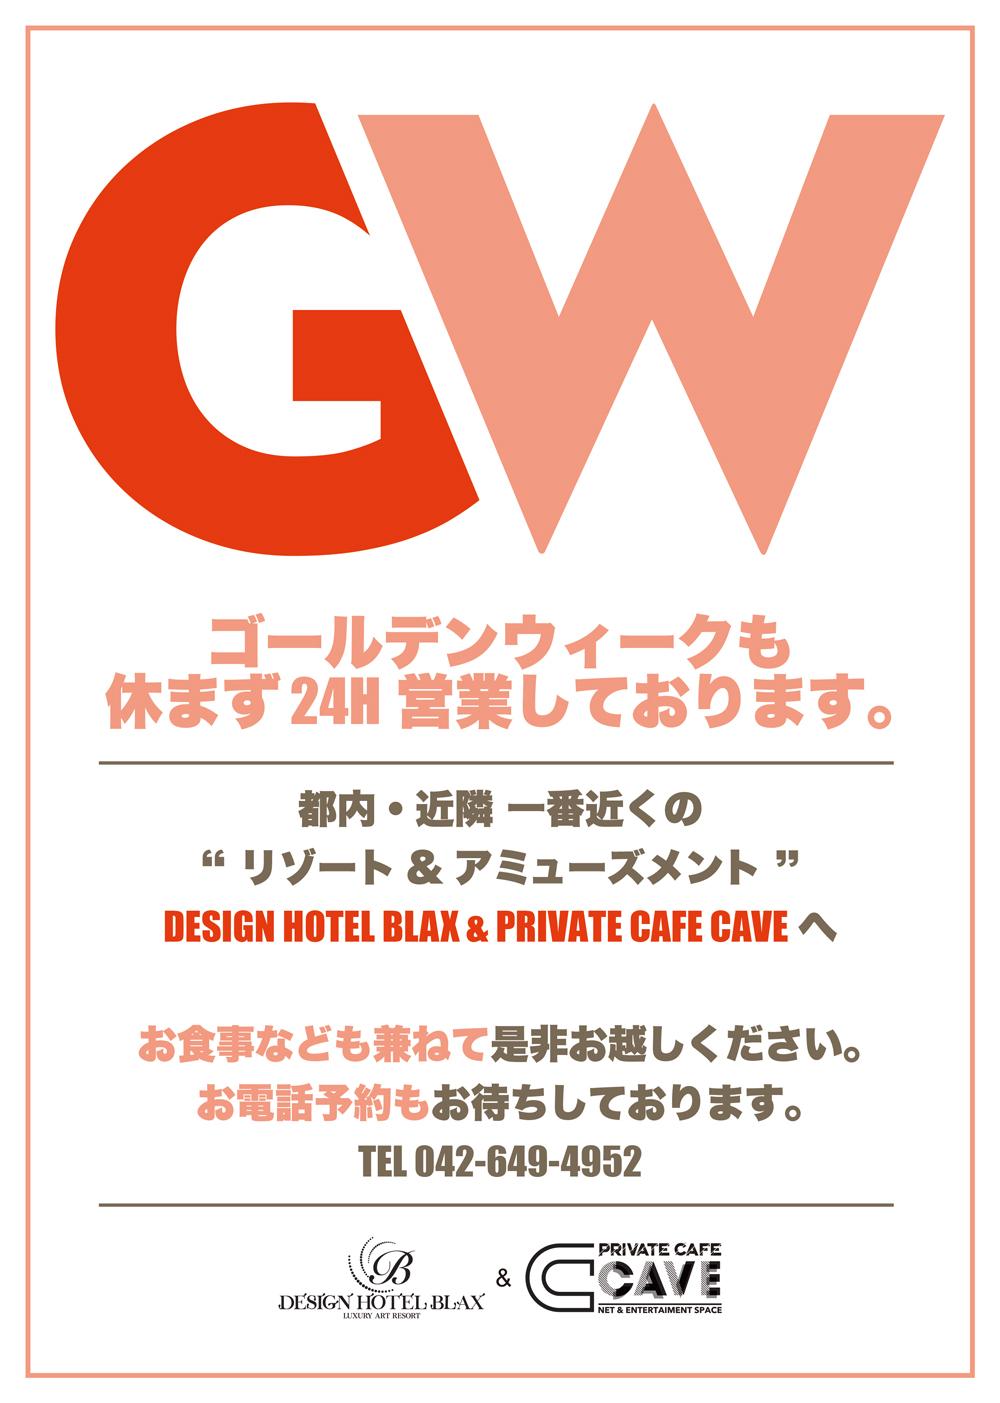 GWも通常営業を行います。